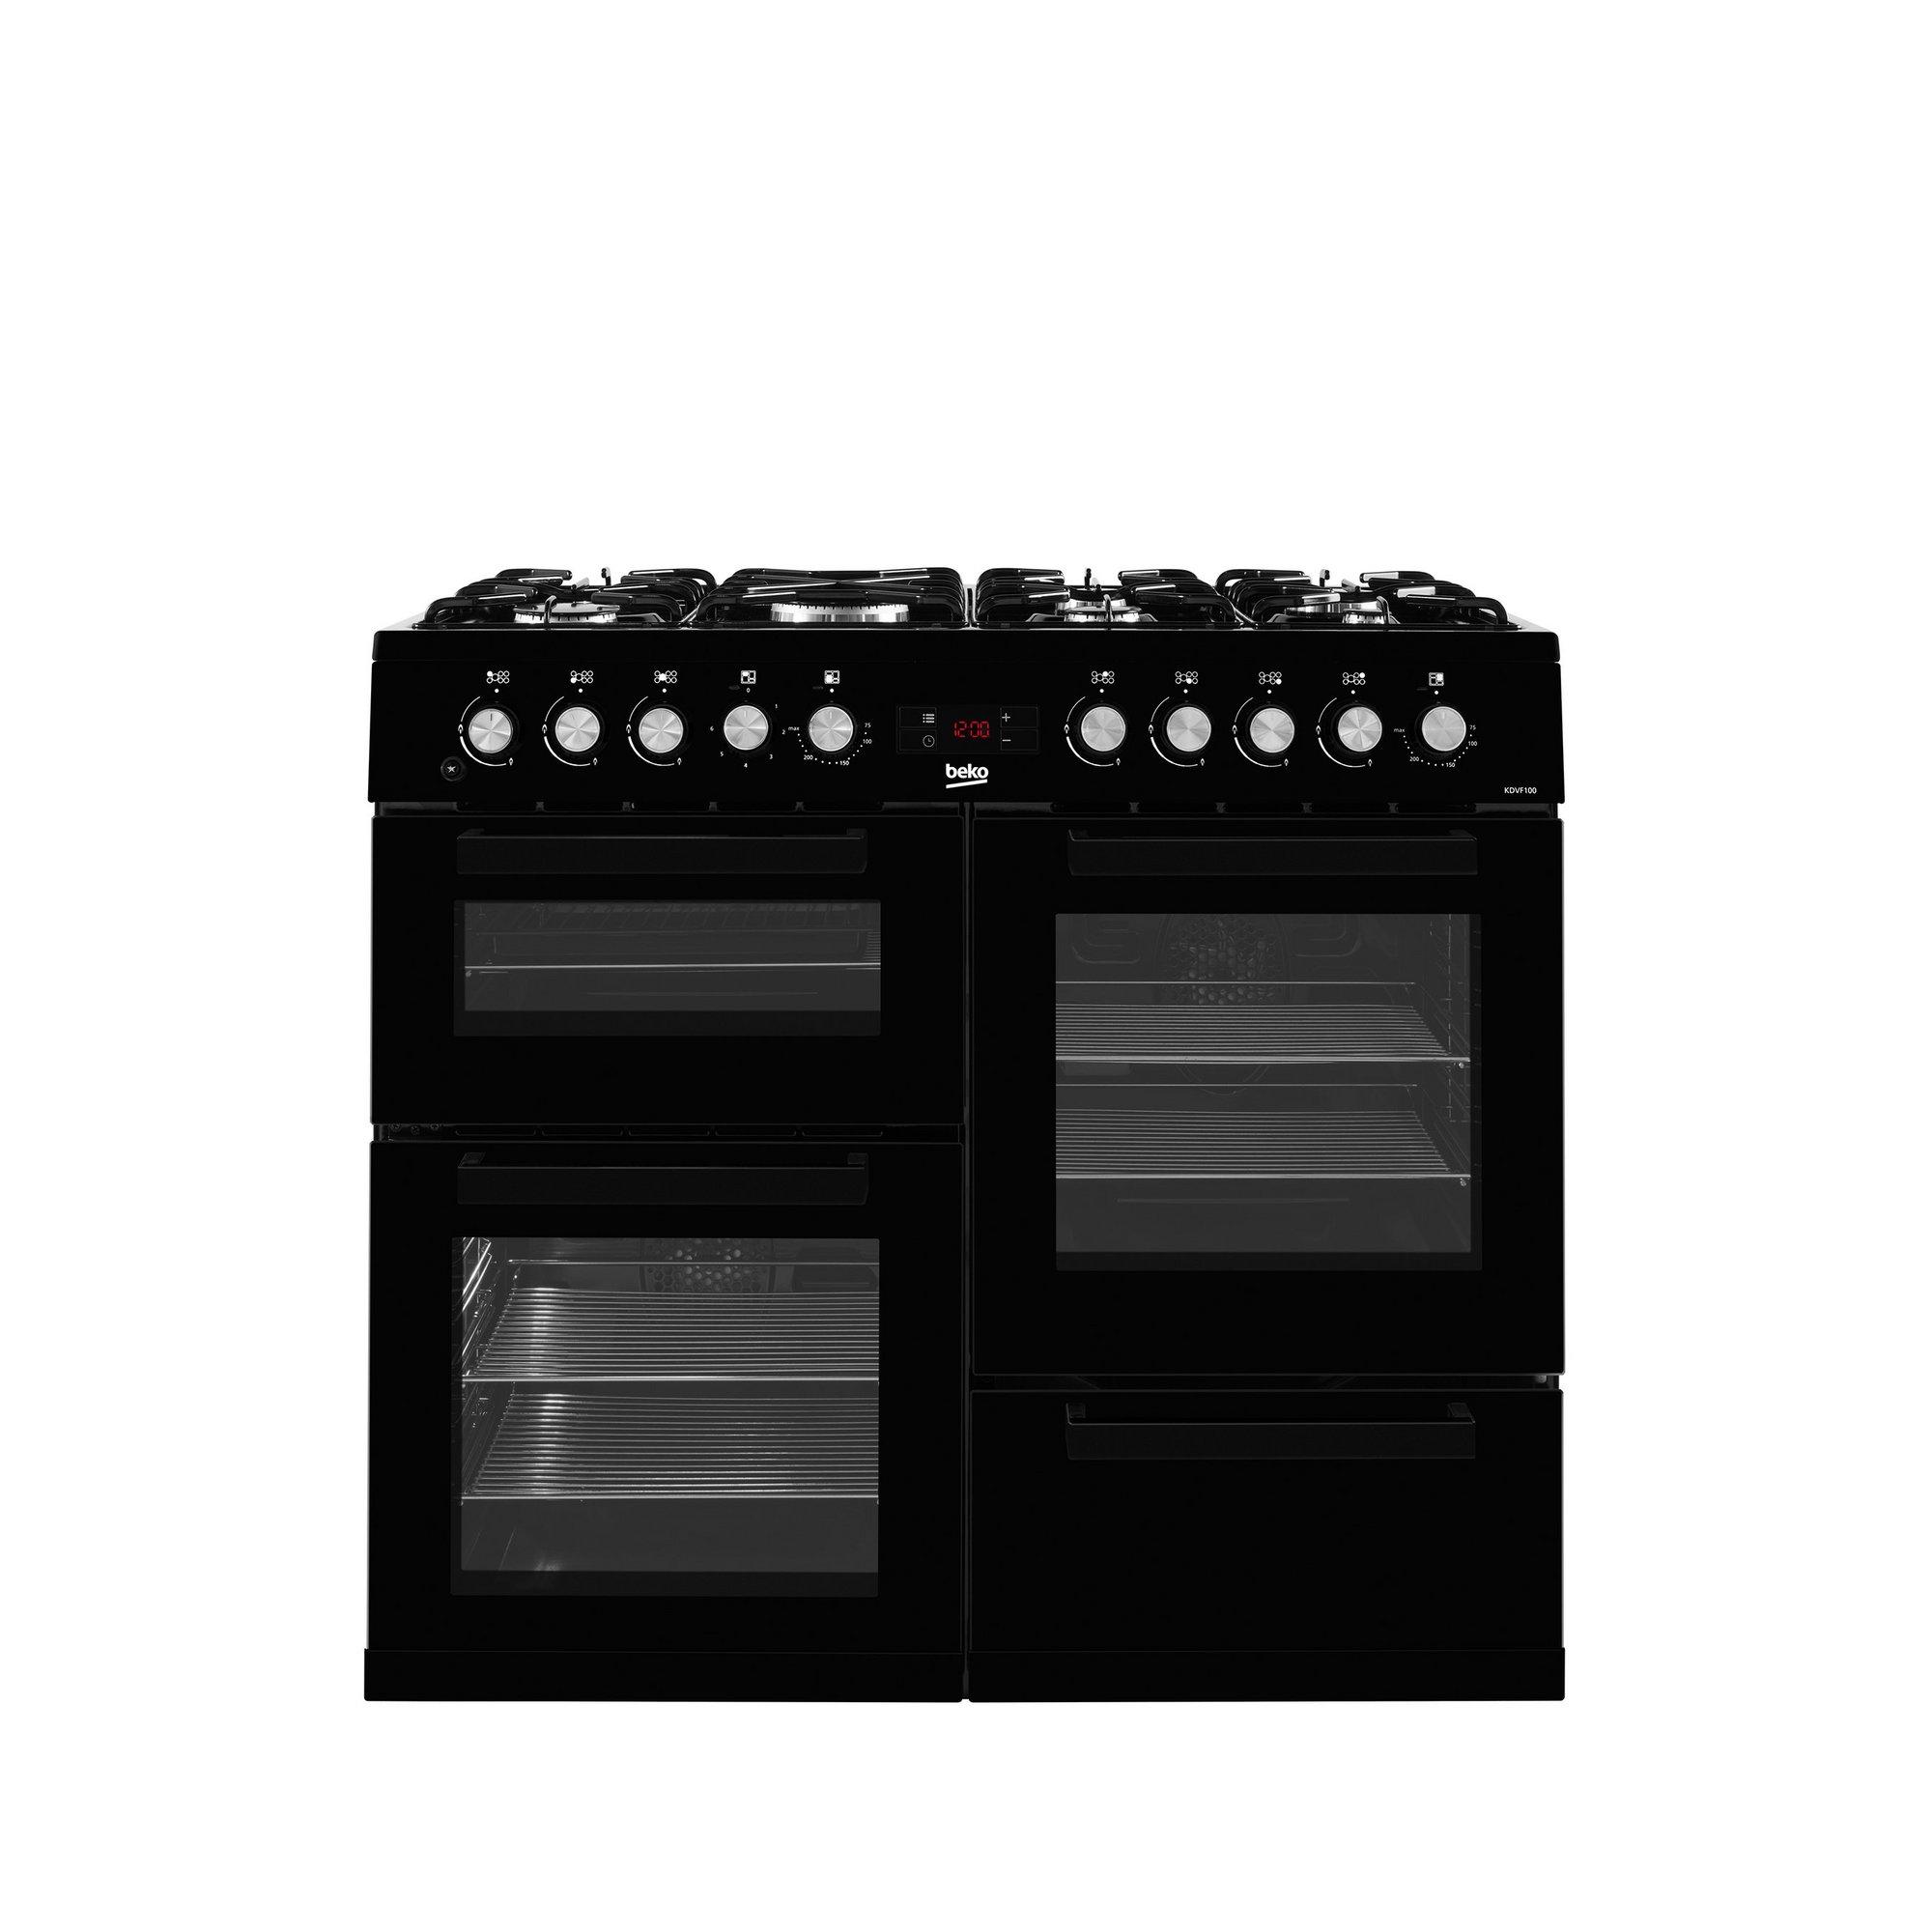 Image of Beko 100cm Dual Fuel Double Oven Range Cooker